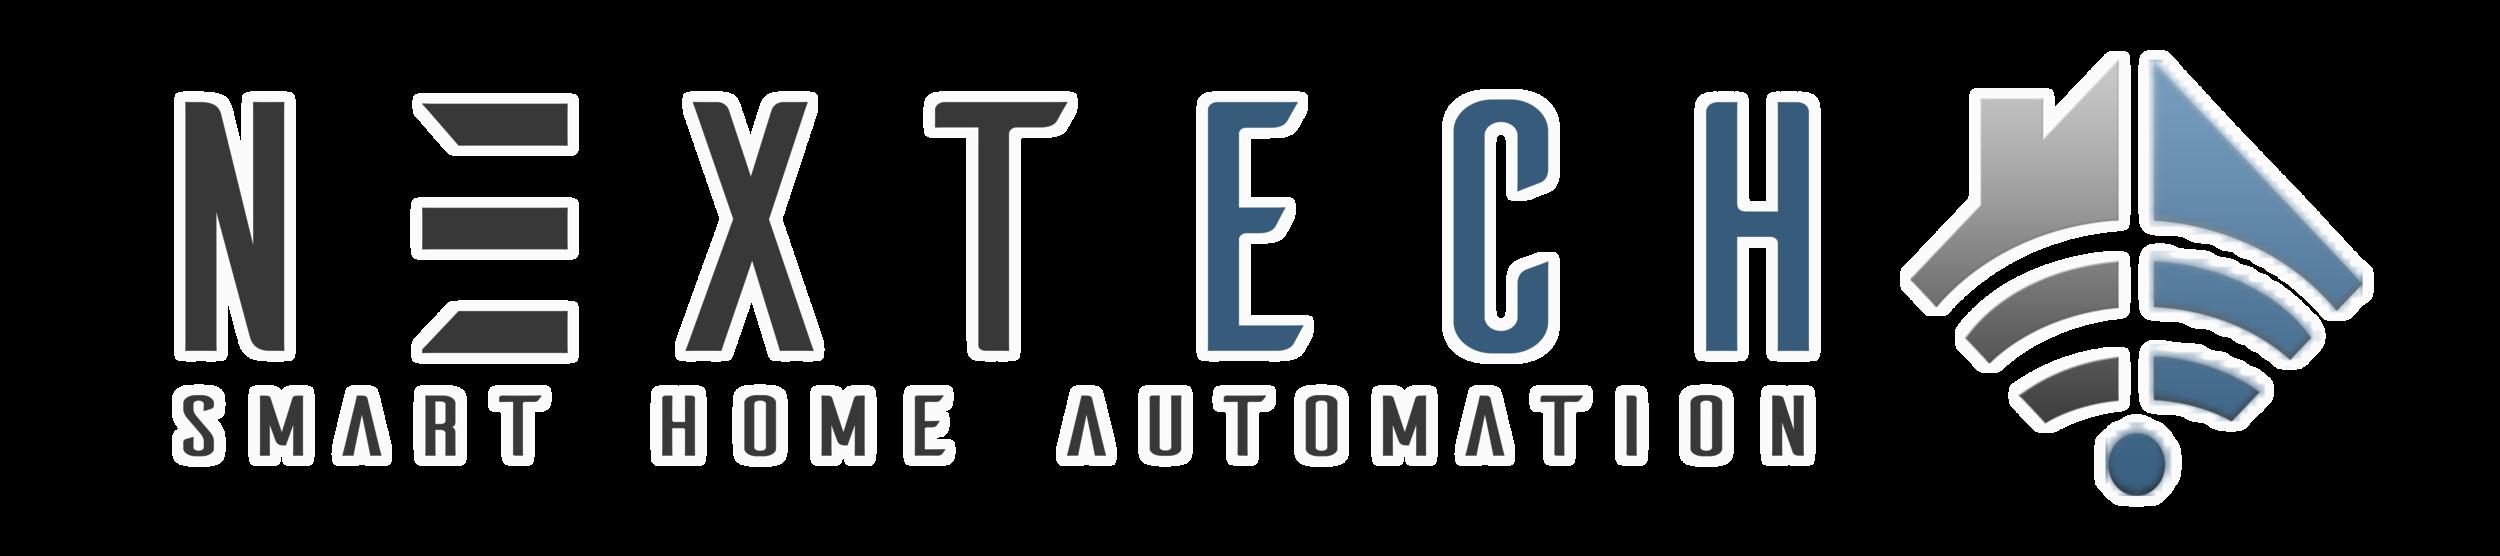 Nextech logo hi res transparent with outerglow-1.png